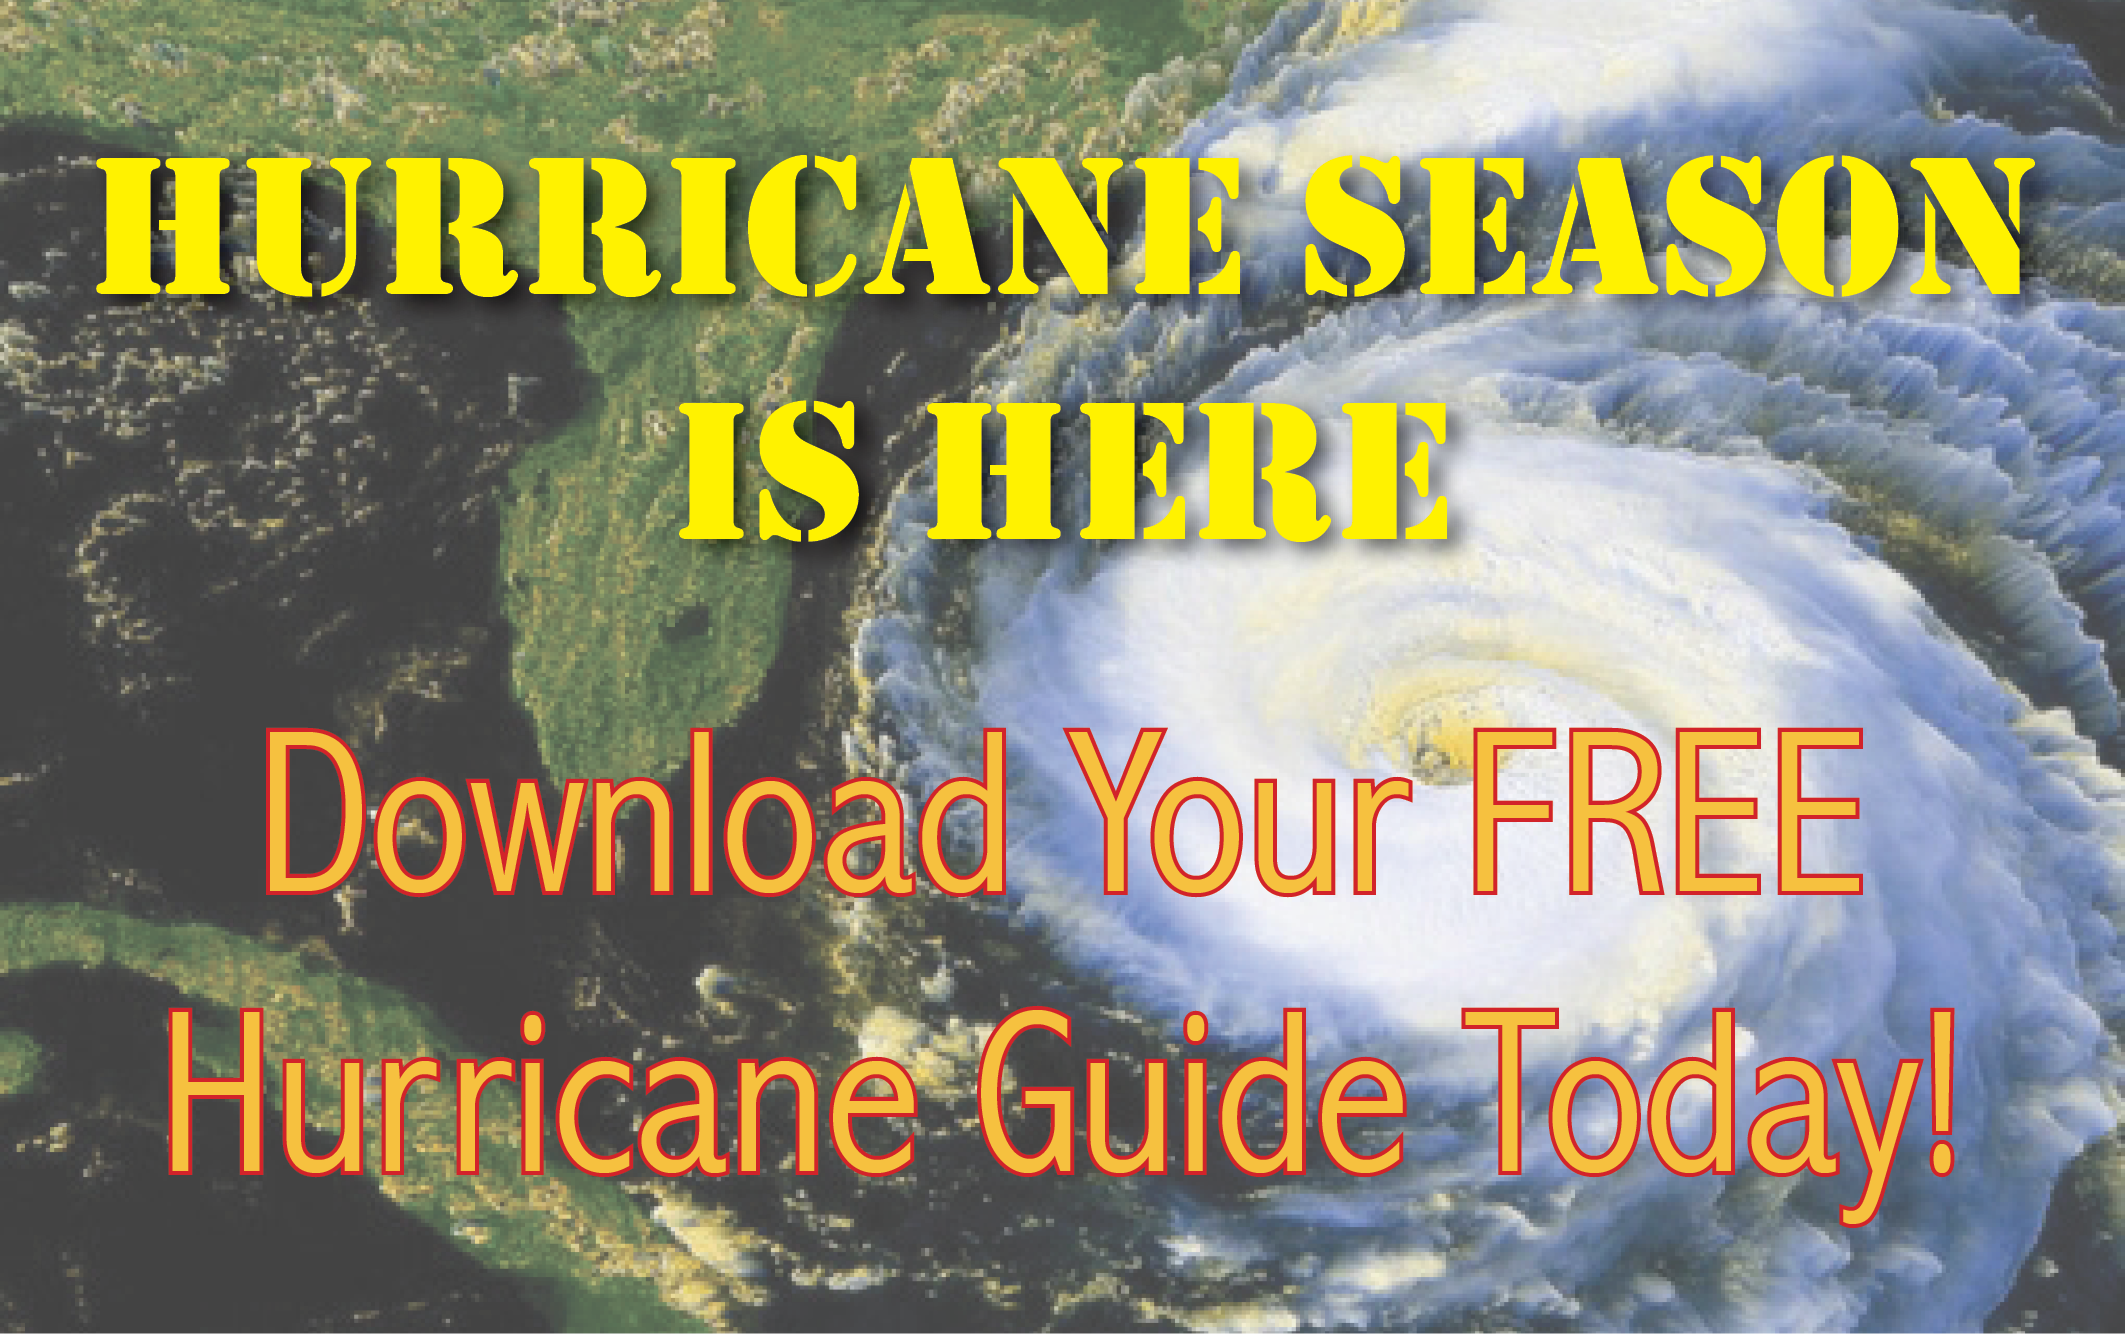 GalleryImage_Hurricane